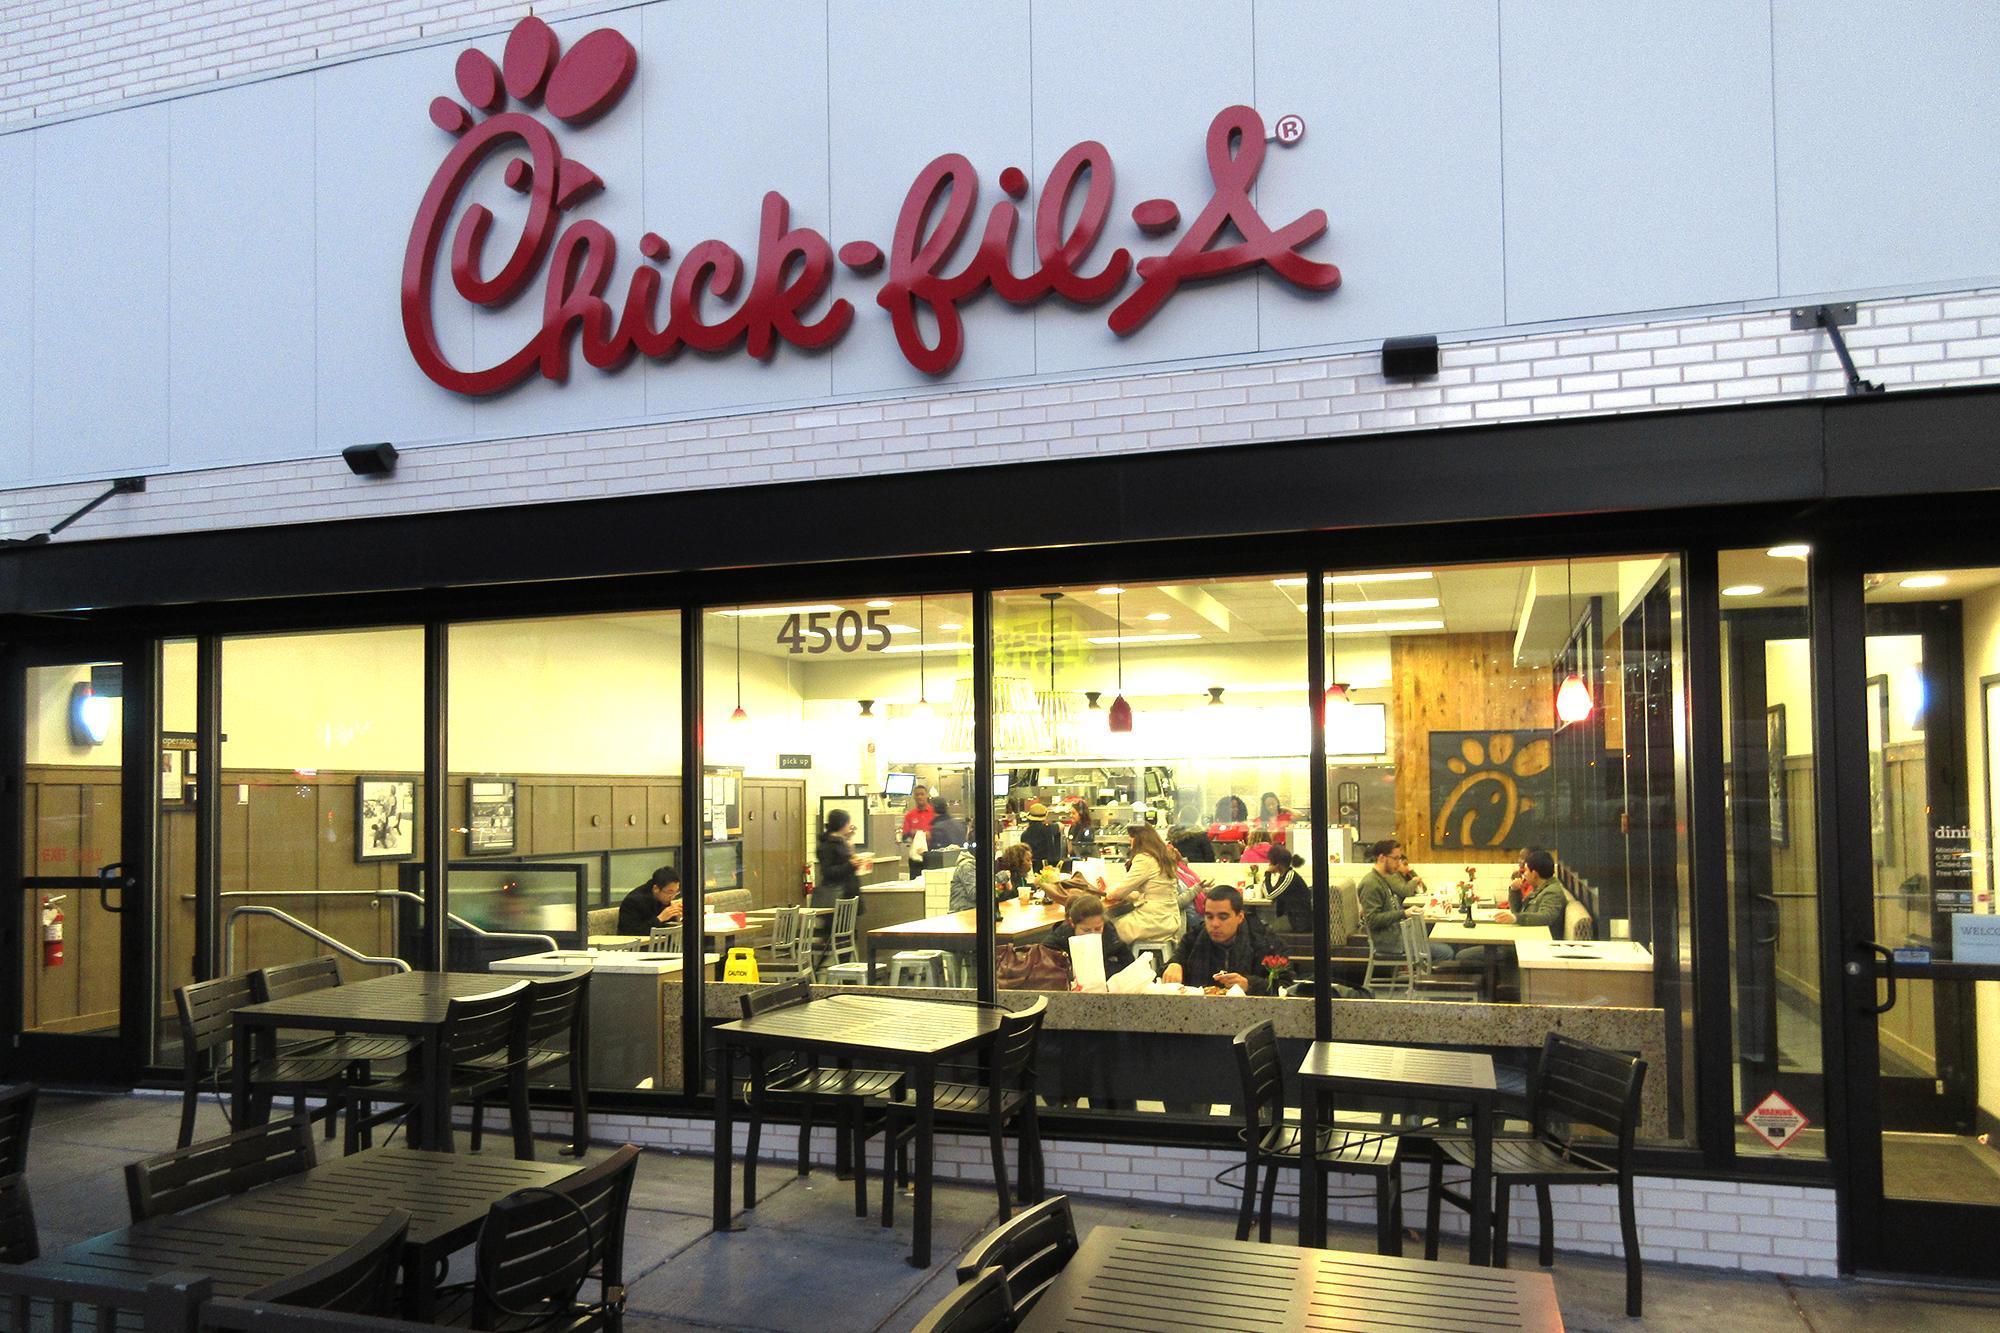 A Chick-fil-A restaurant in Washington, D.C.